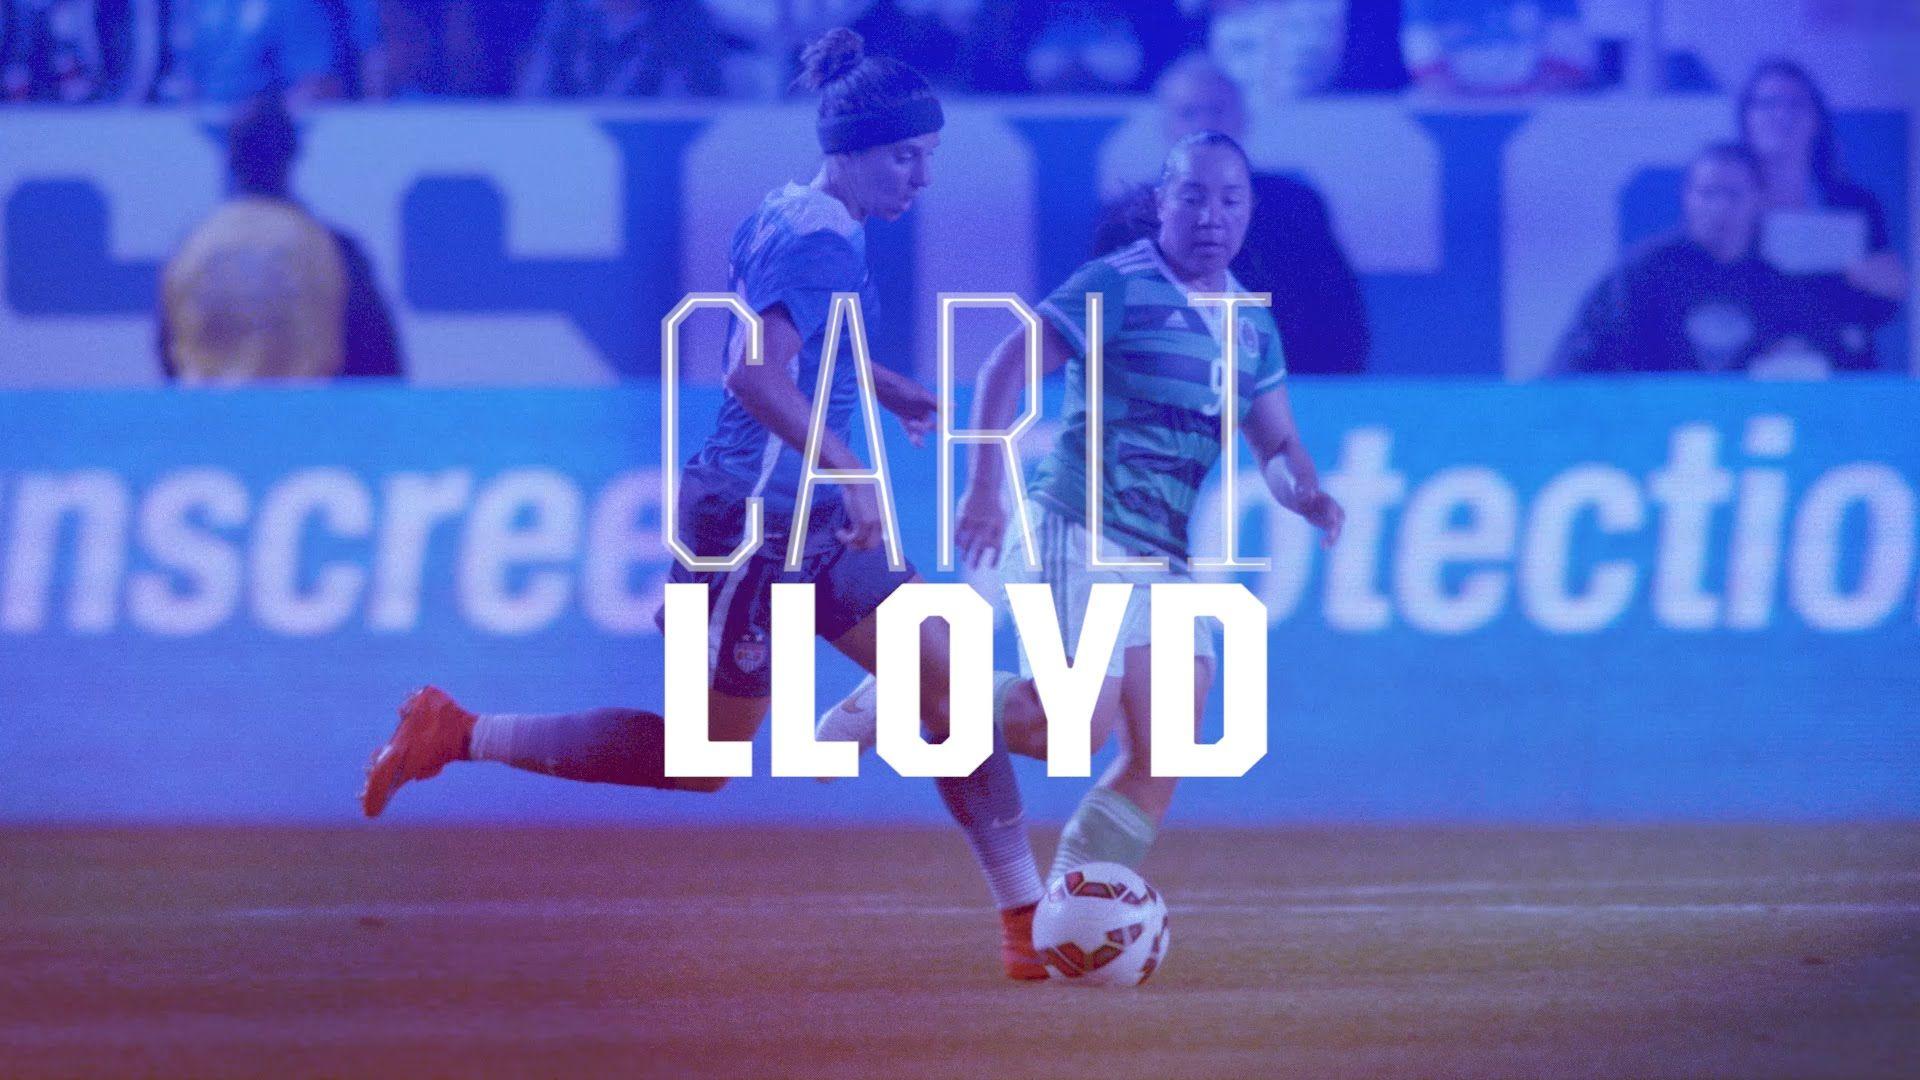 Carli Lloyd 2015 Uswnt Roster Video Card Carli Lloyd Soccer Inspiration Uswnt